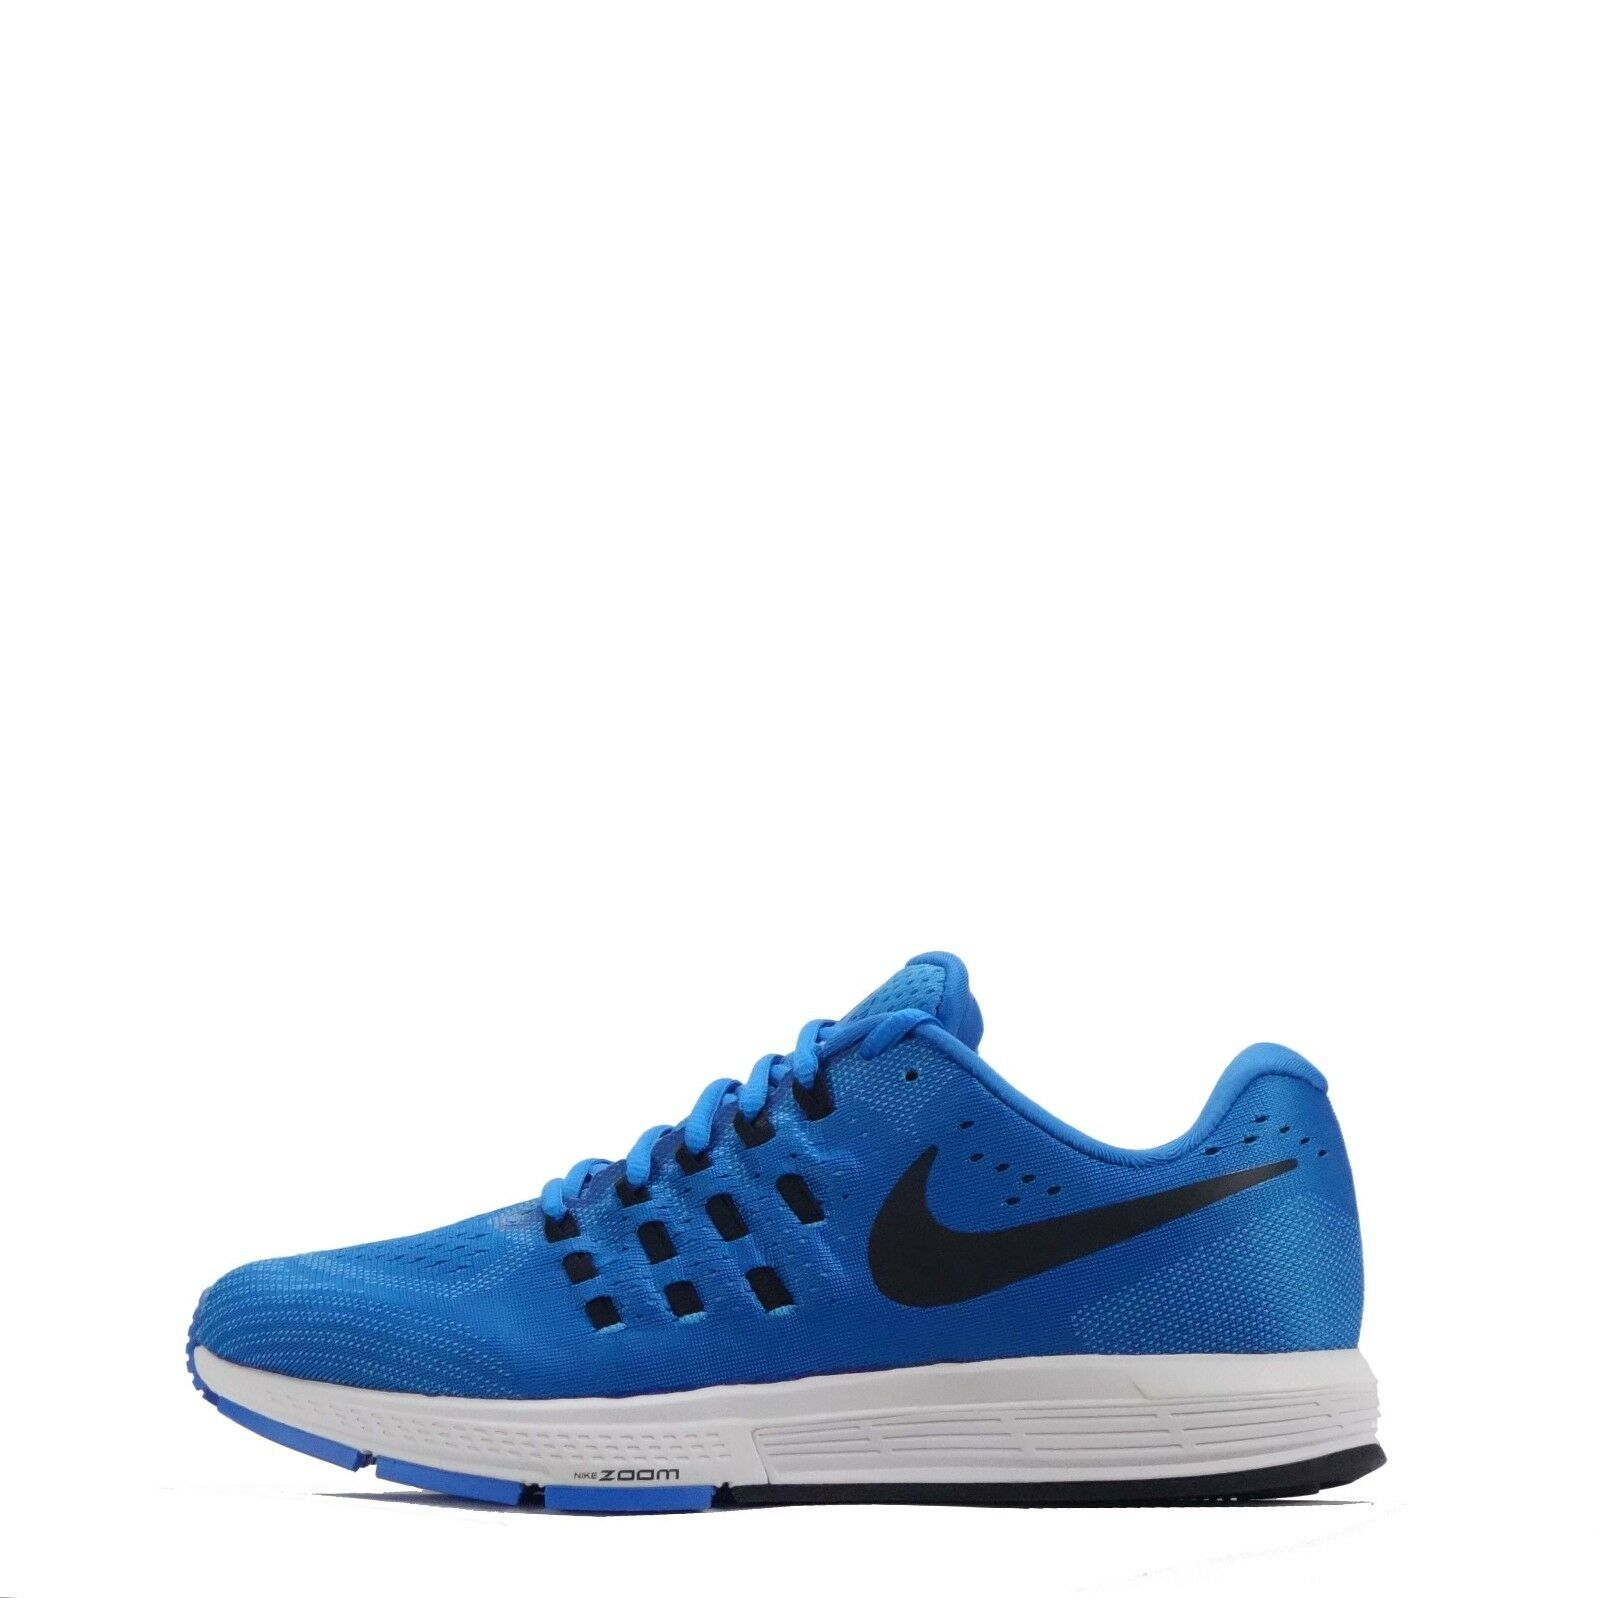 Nike Air Zoom Vomero 11 Men's Running Lightweight Running Shoes Blue/Black